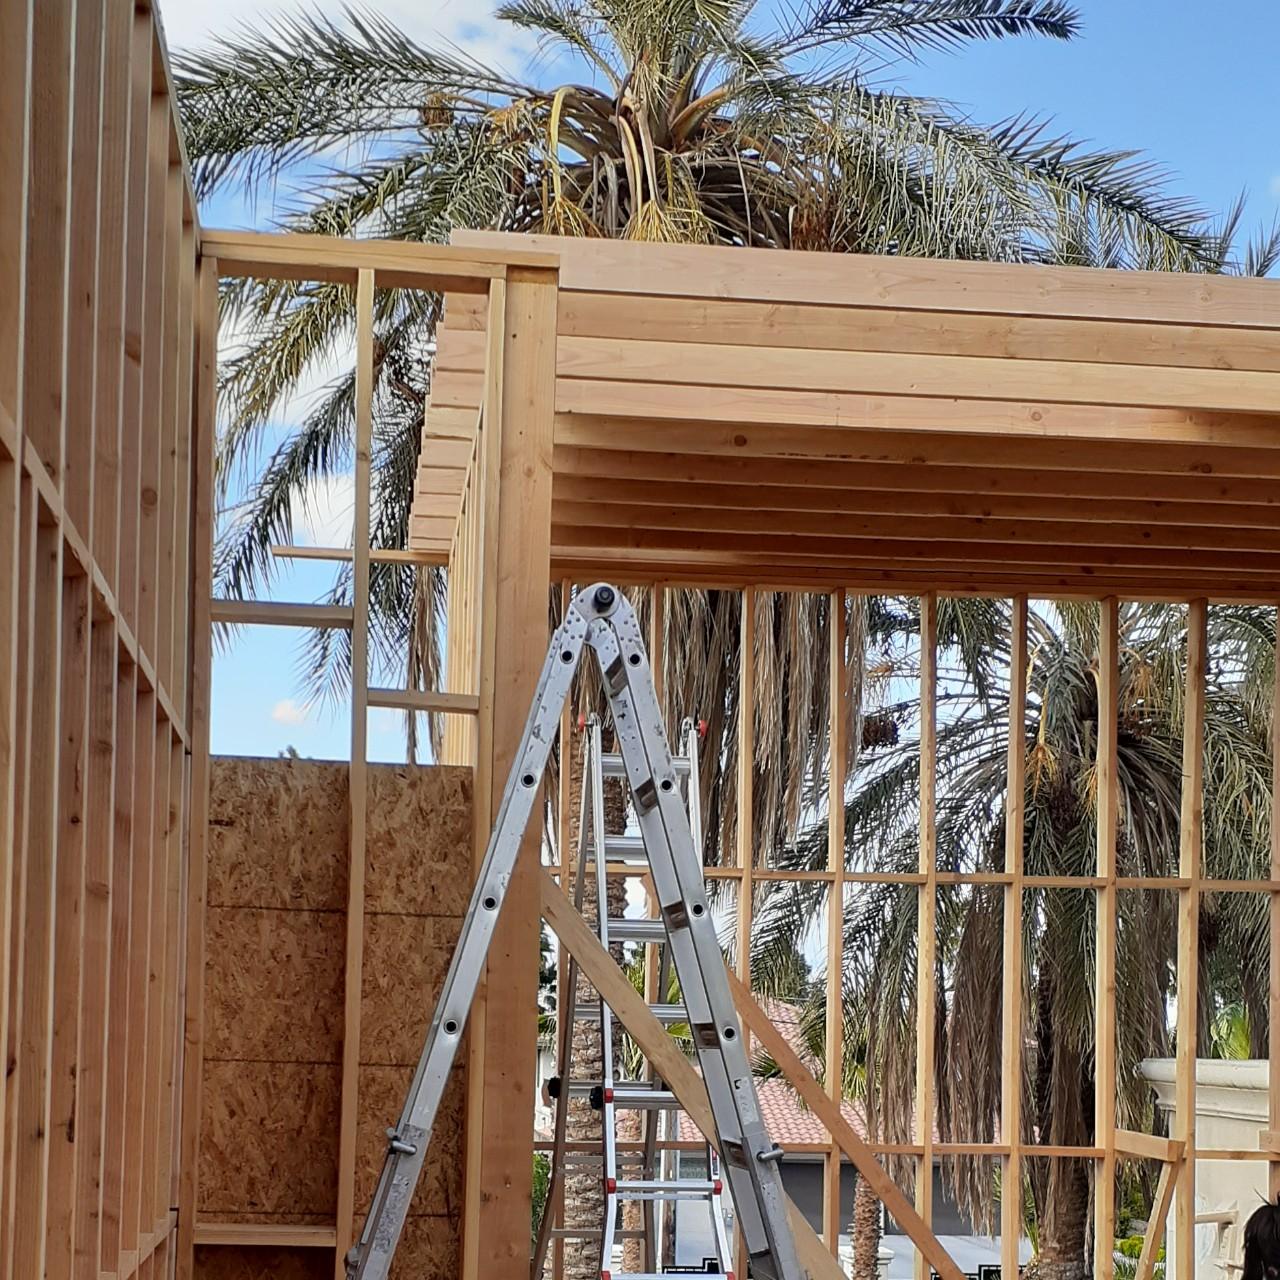 carpentry-wood-framing-second-floor-home-addition--framing-102